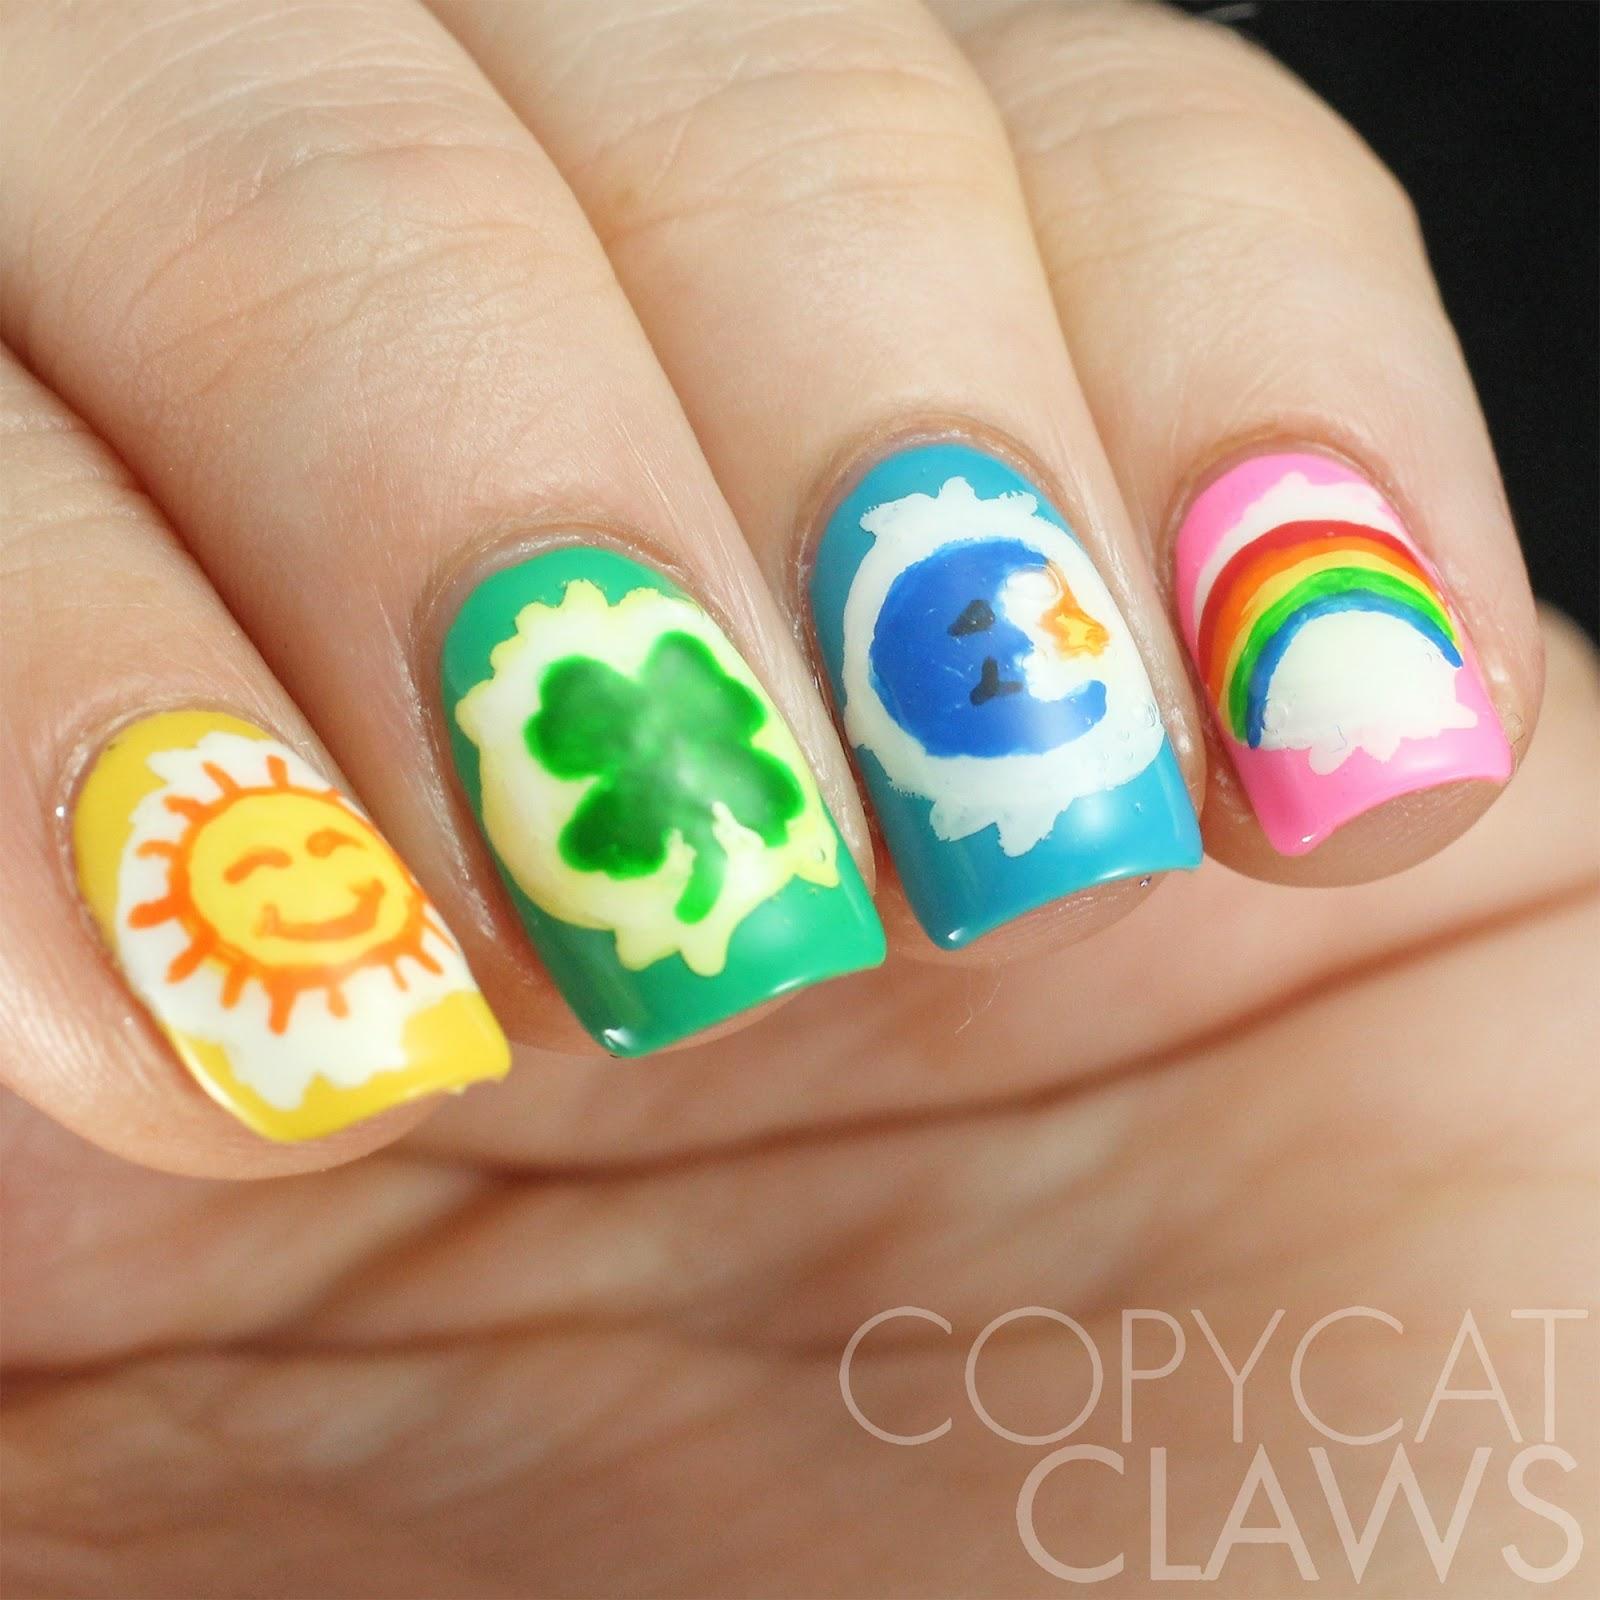 Copycat Claws: 40 Great Nail Art Ideas - Kids TV